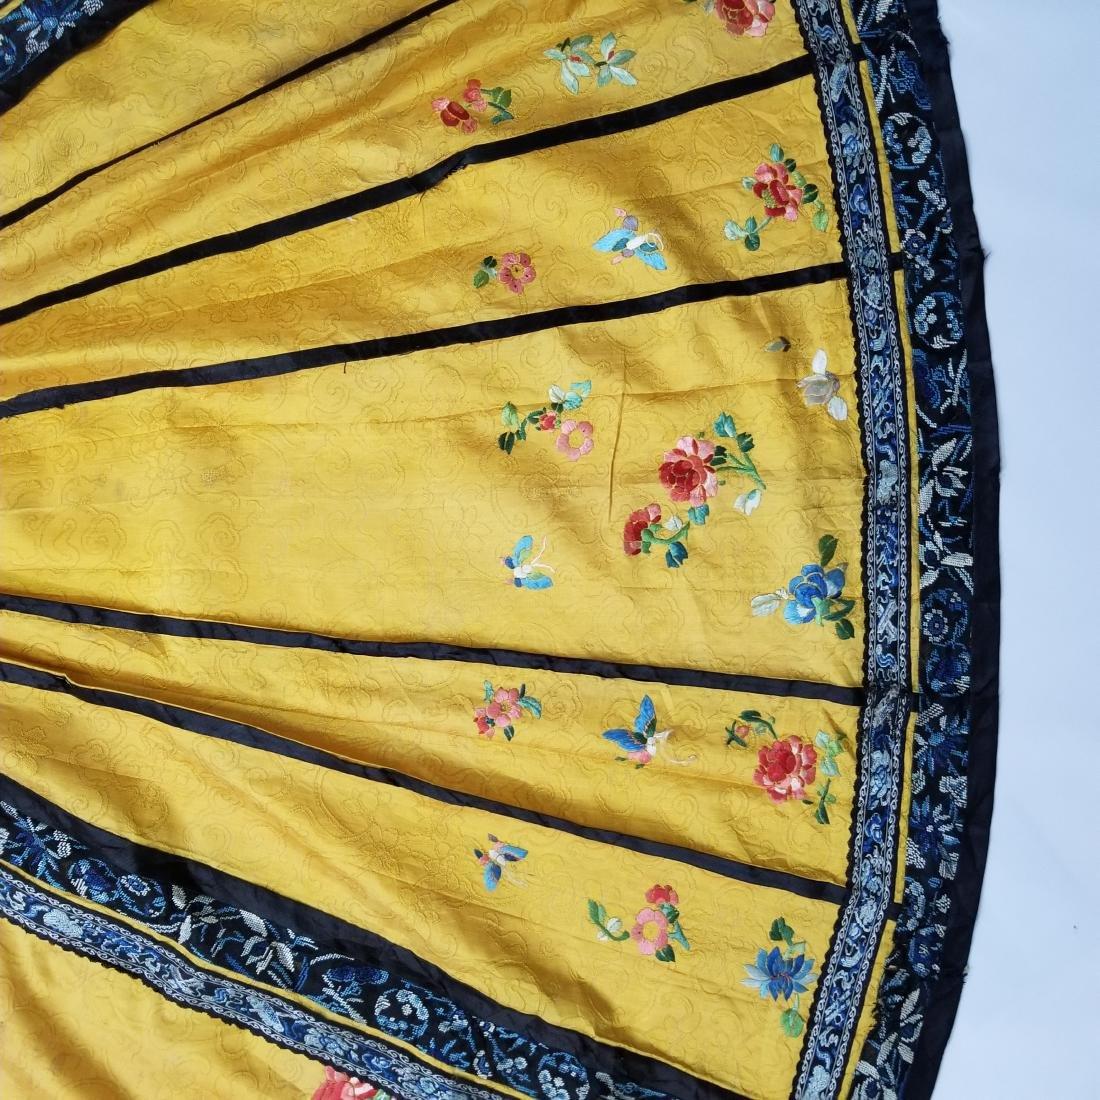 Antique Chinese Silk Hand Embroidered Skirt Forbidden - 3